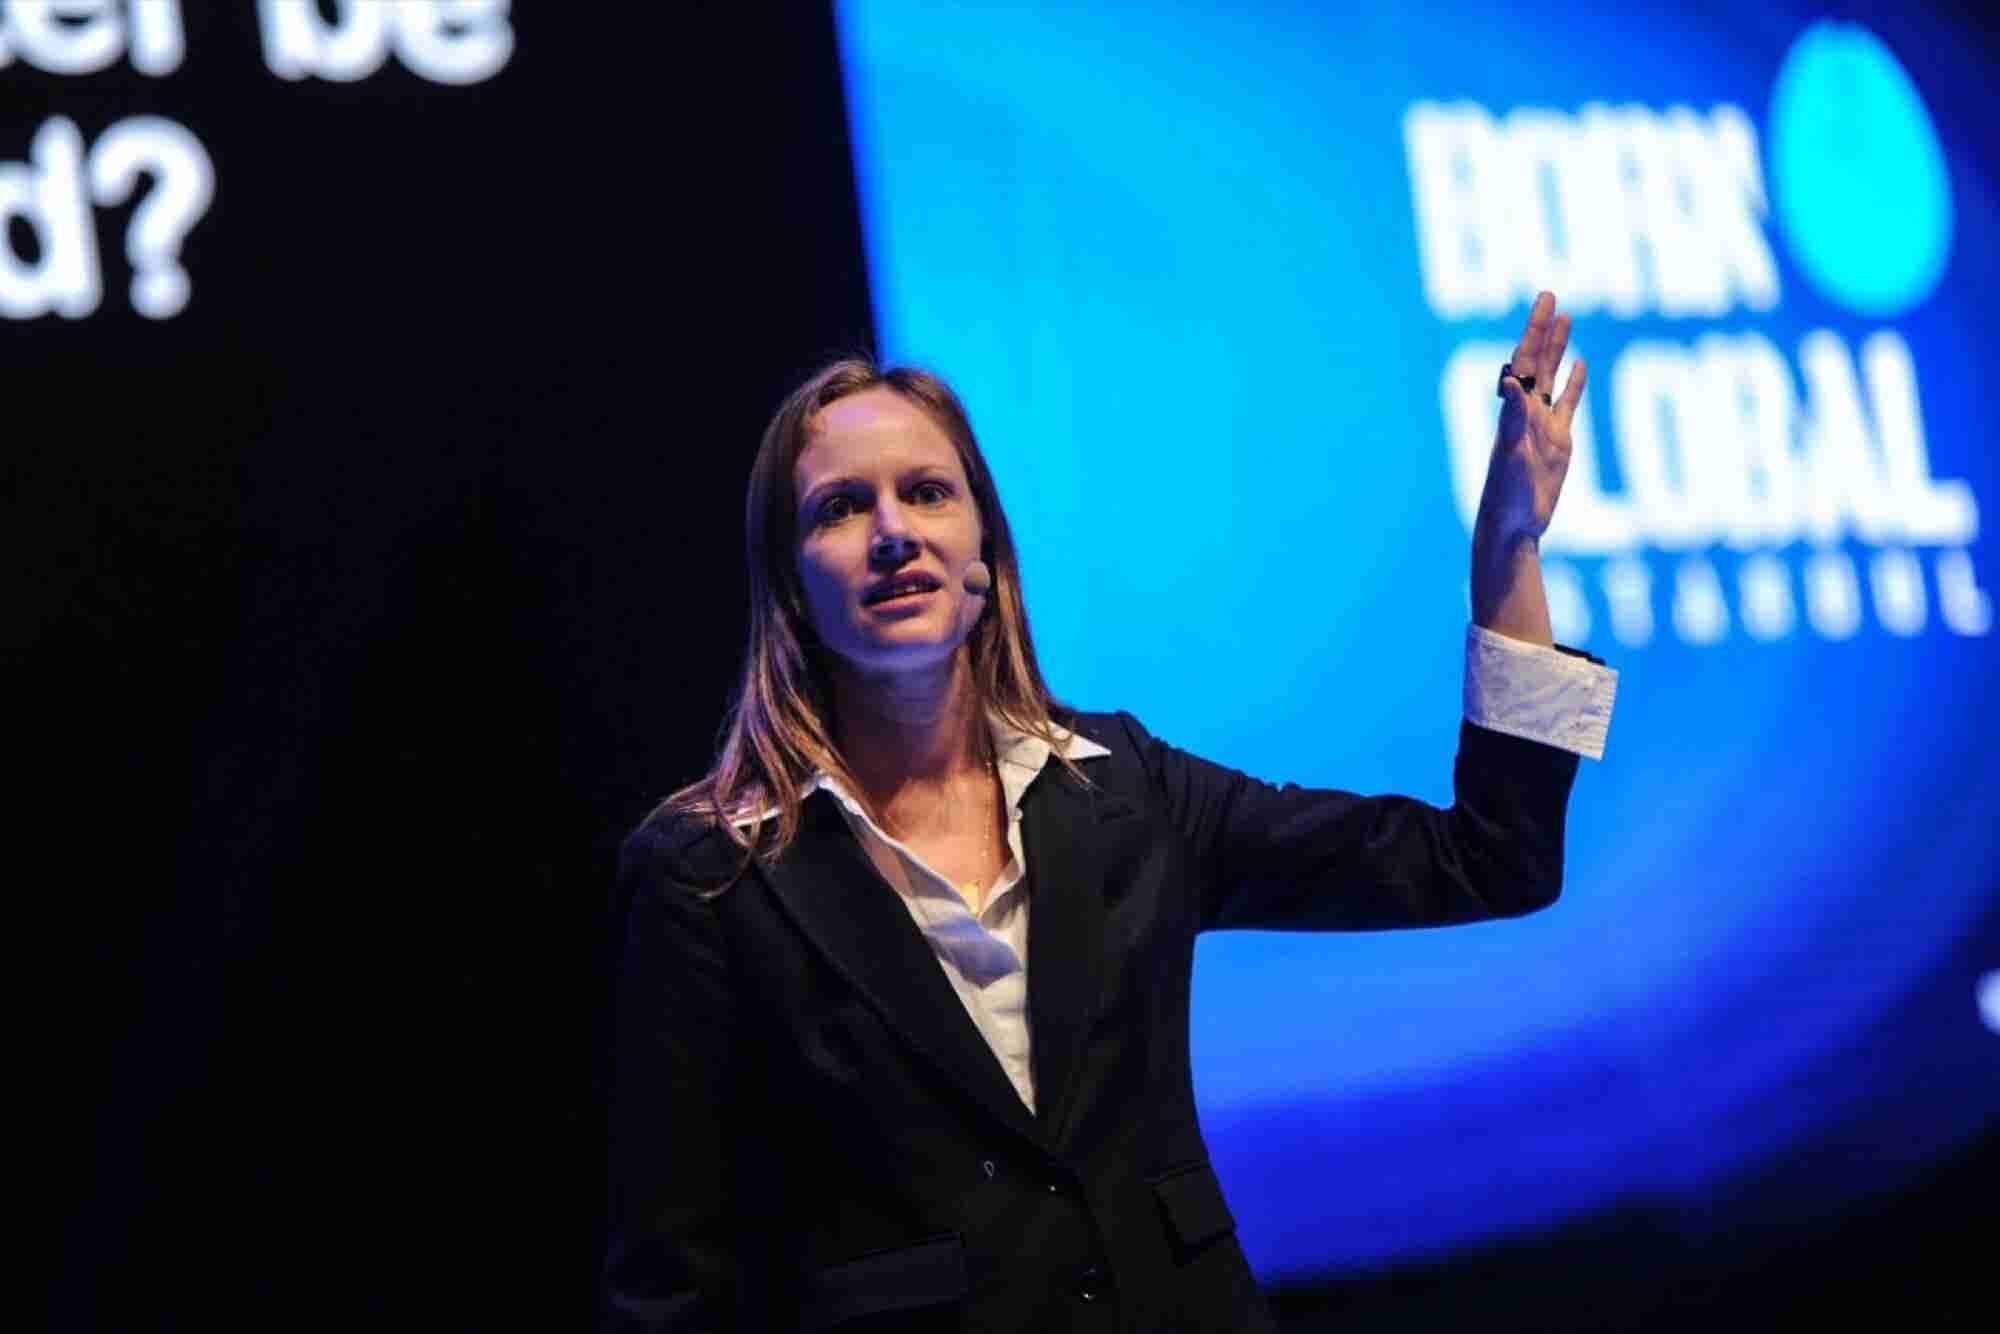 Social Media For Social Good: Claire Diaz-Ortiz On How Social 'Treps Can Boost Their Digital Presence